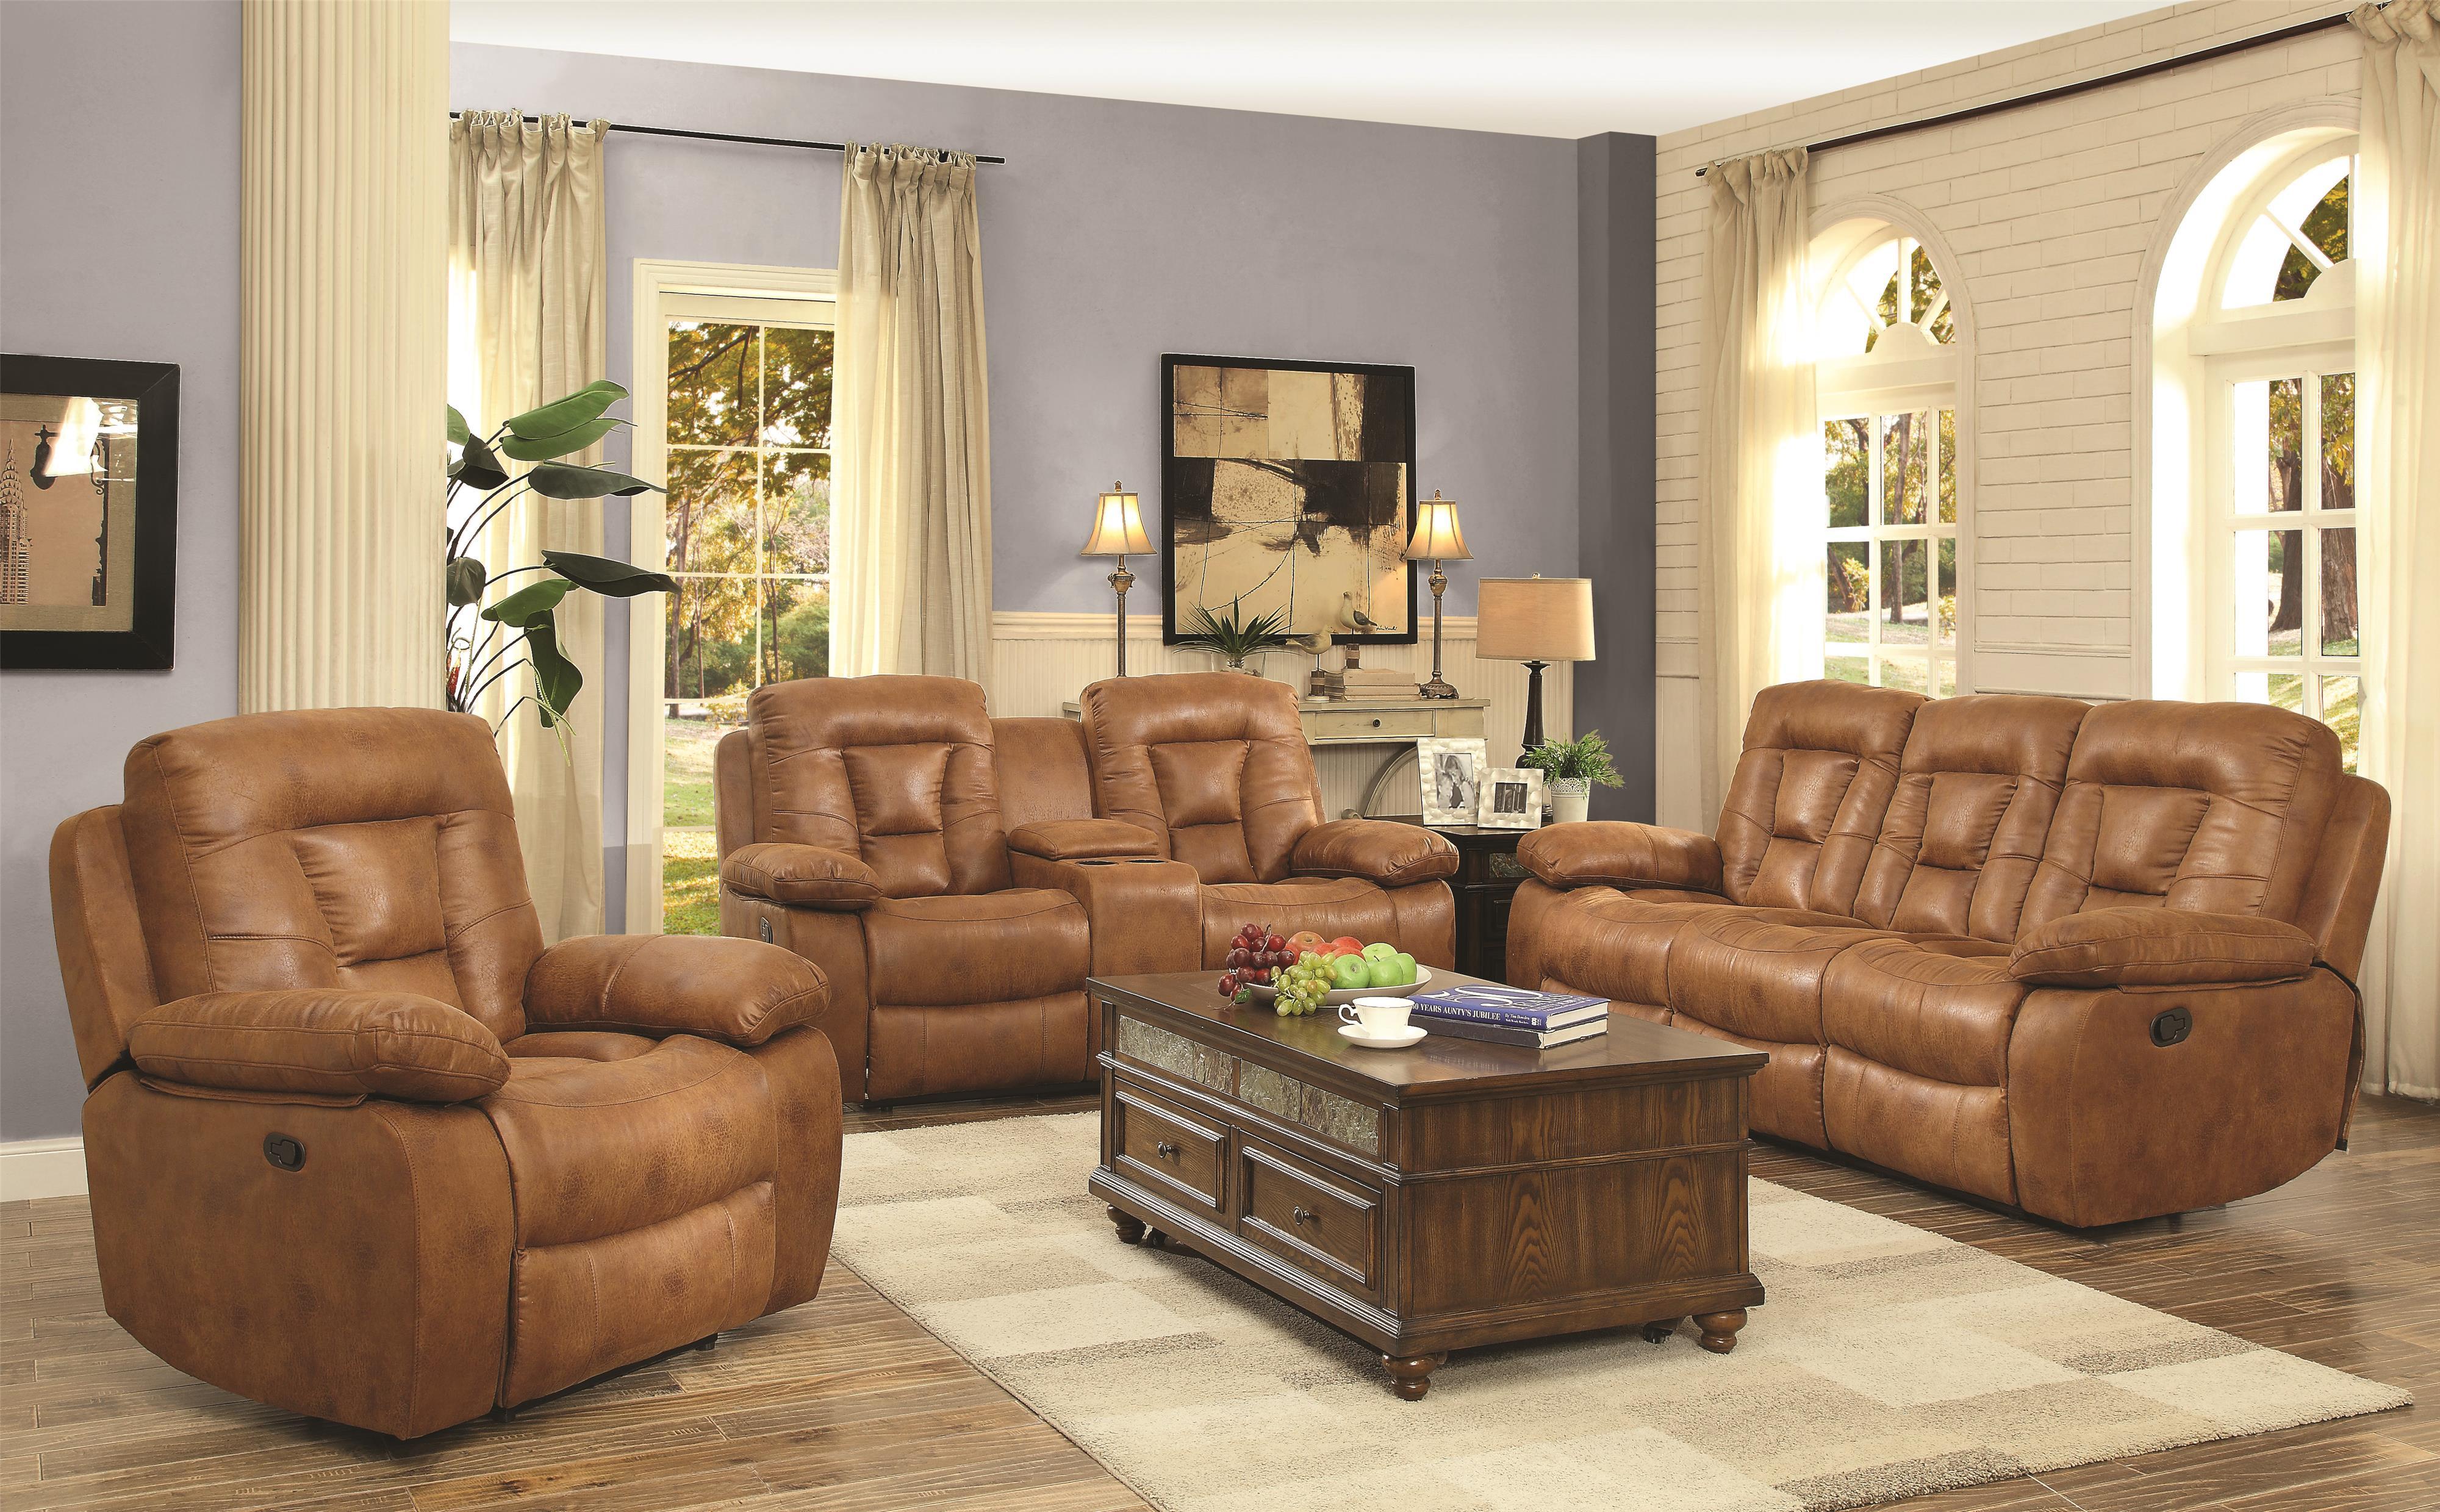 Coaster Evensky Reclining Living Room Group - Item Number: 60186-Saddle Living Room Group 1